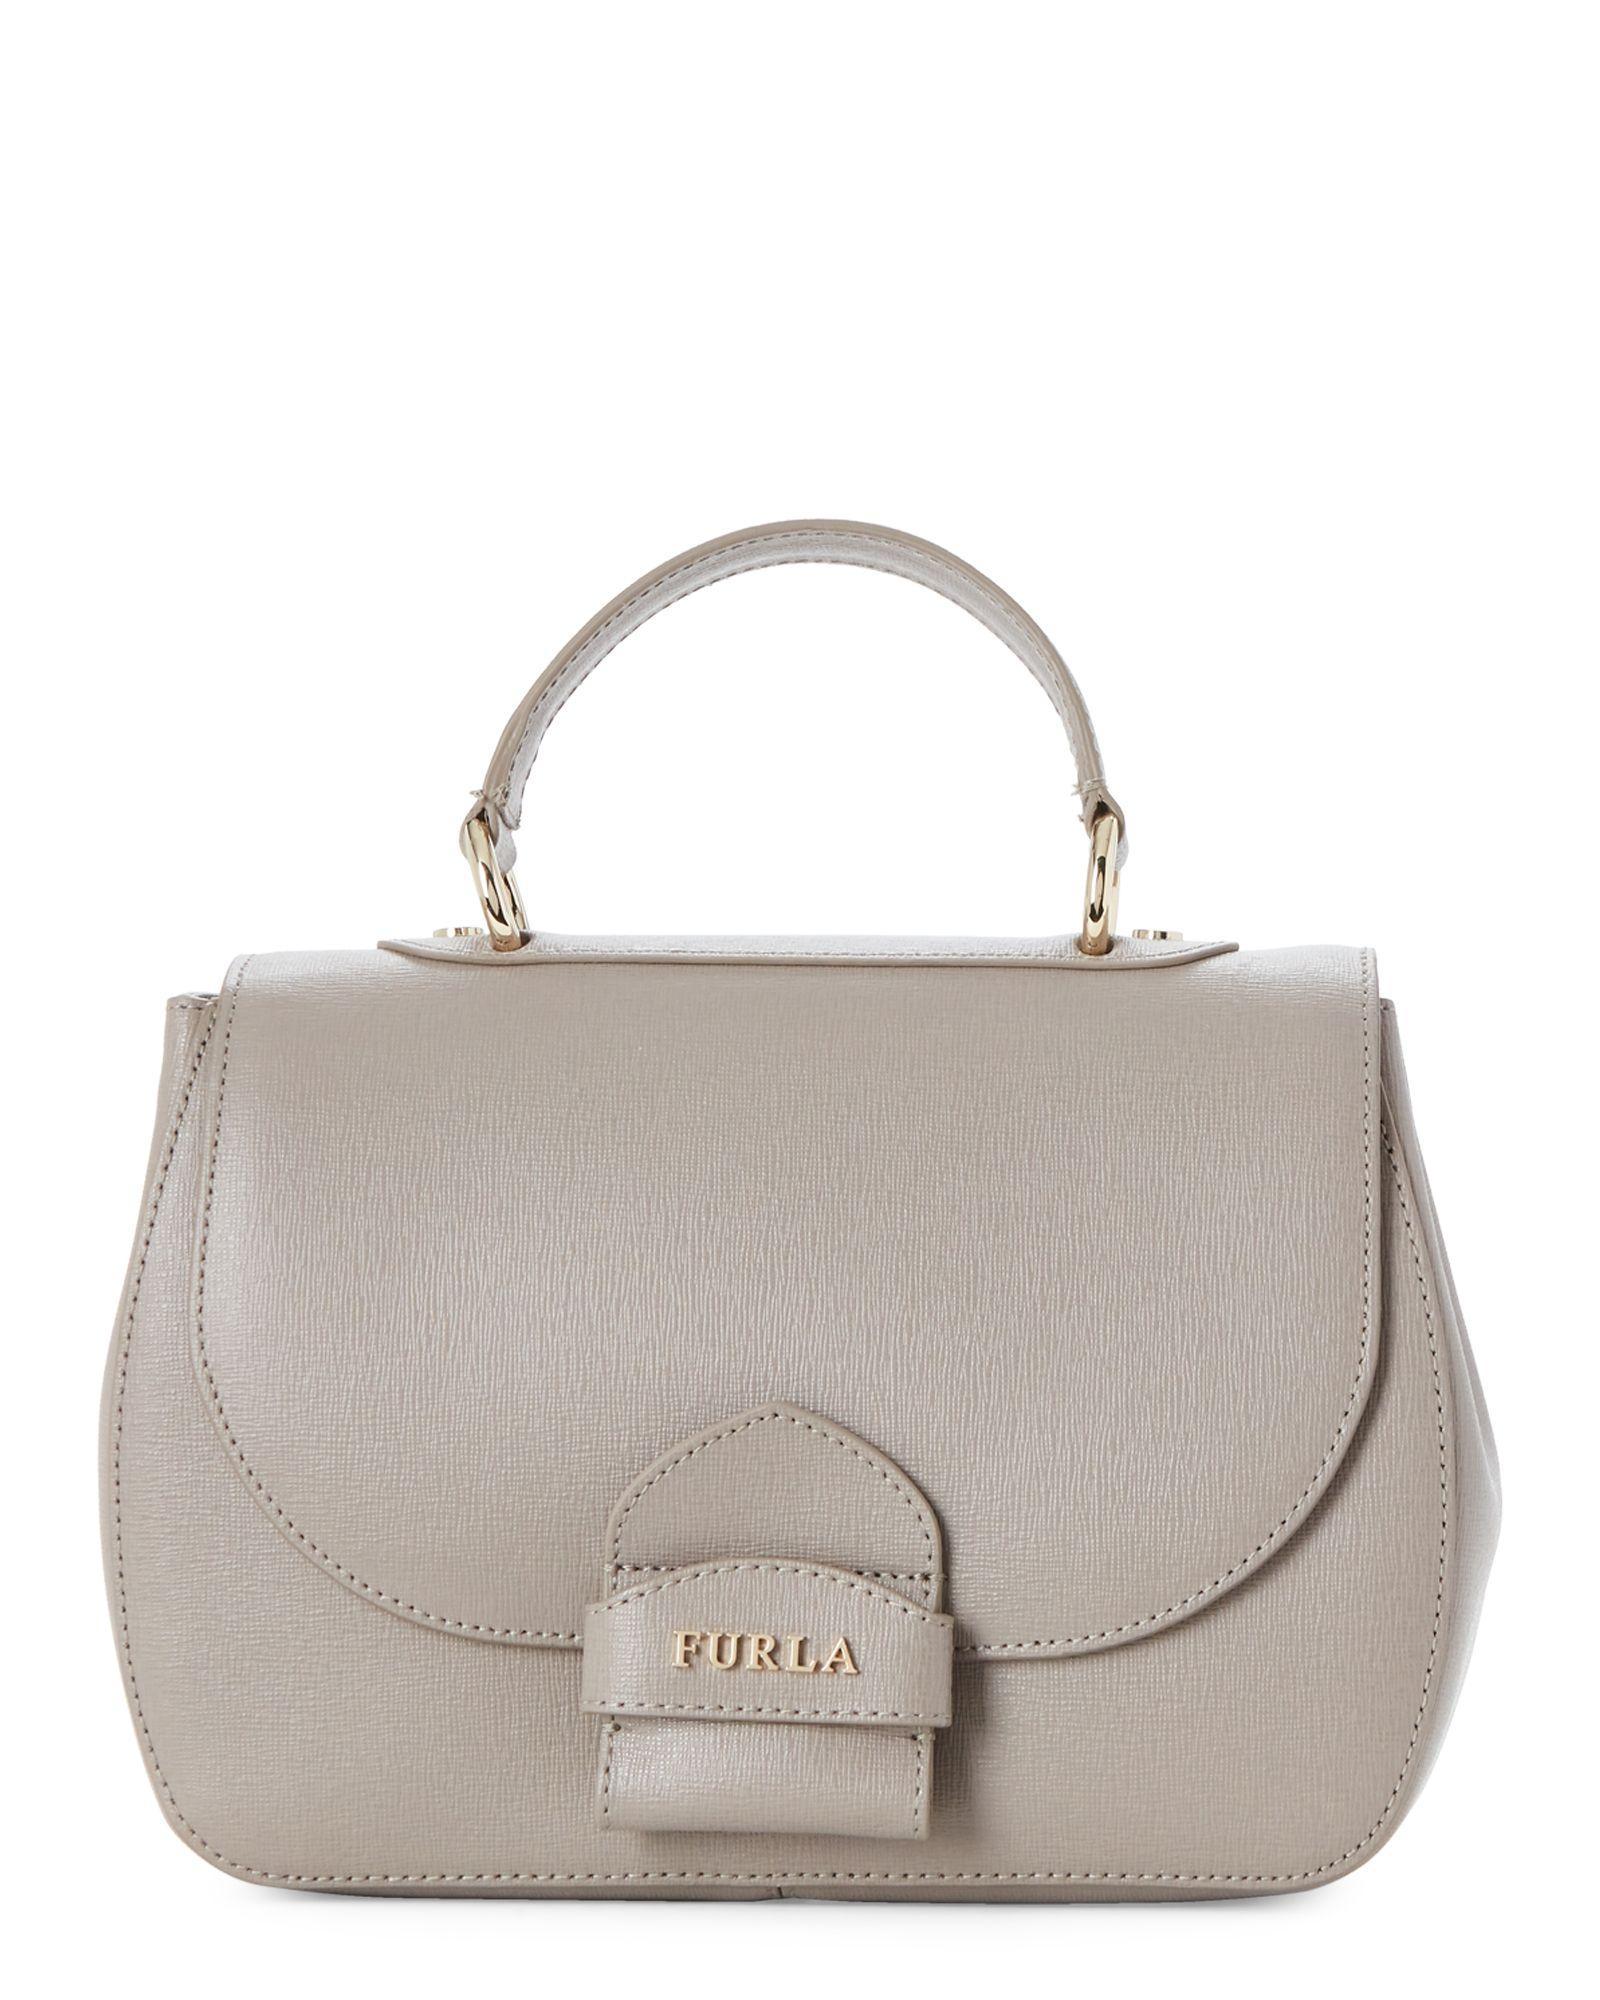 3096b5a4f6 Sabbia Coral Saffiano Leather Small Top Handle Bag | *Apparel ...